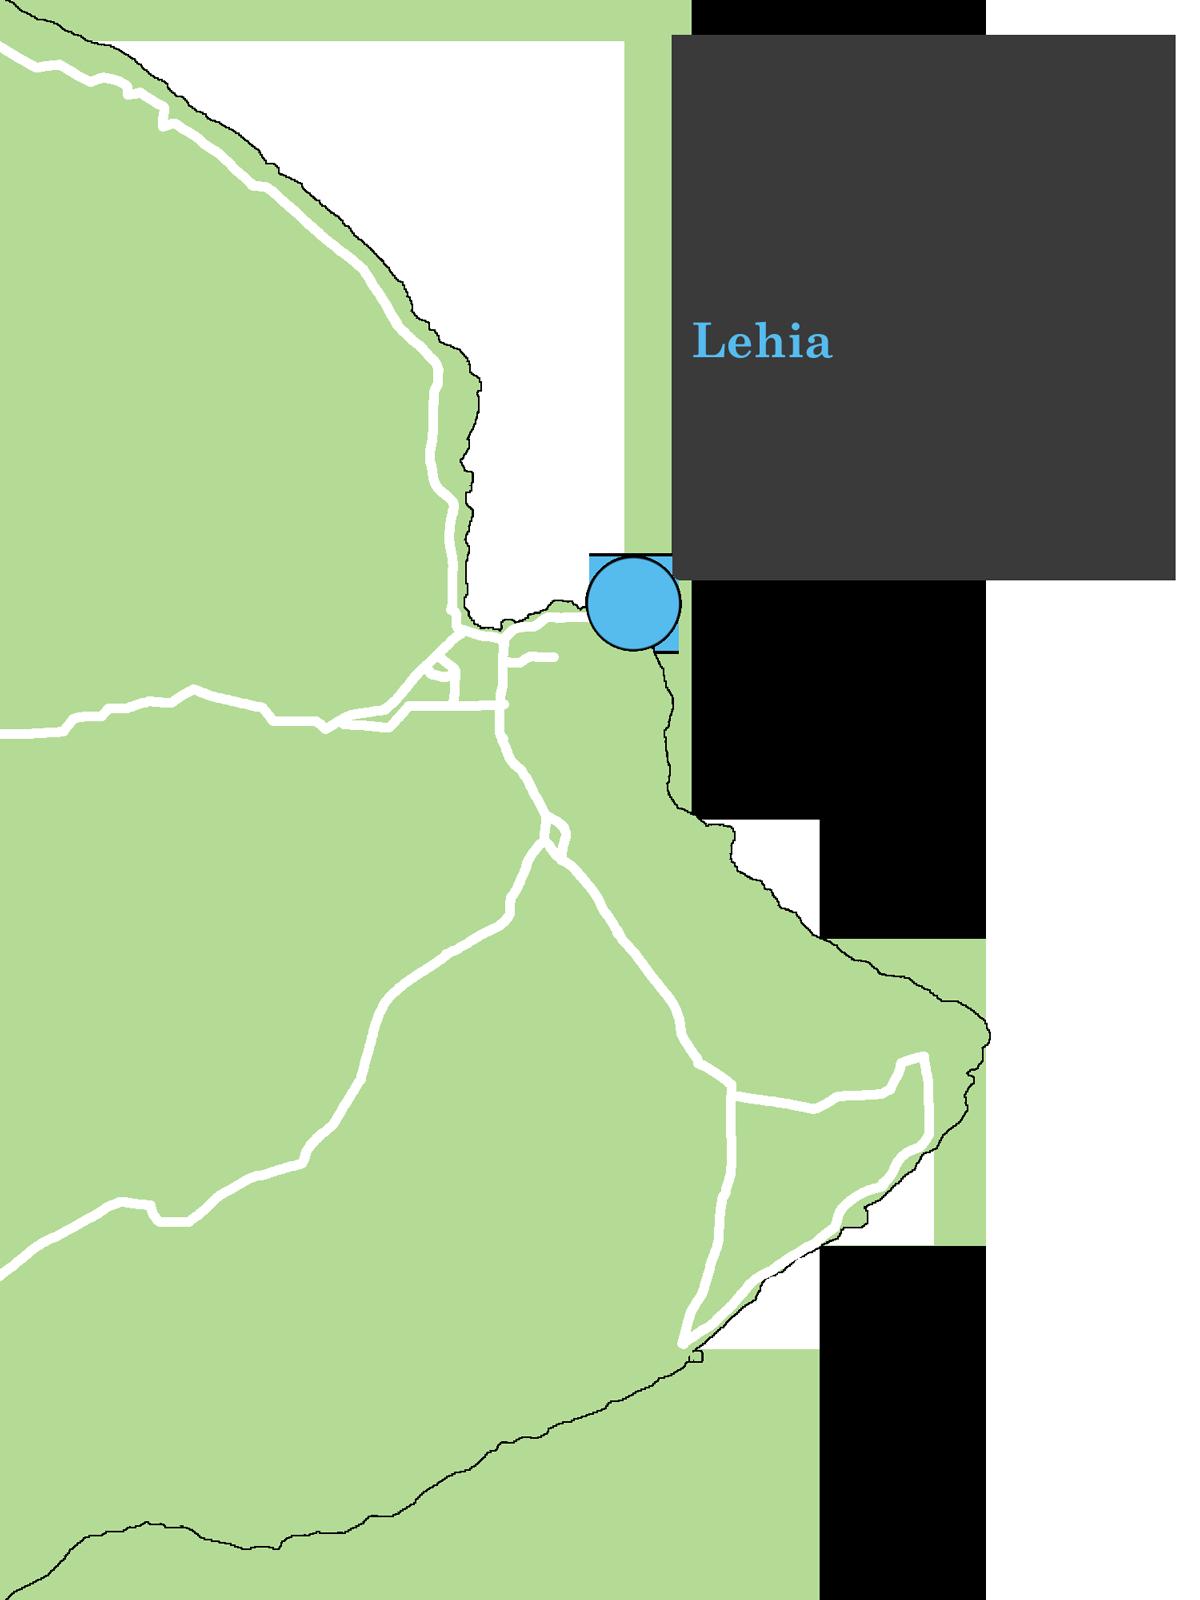 LehiaHiloMap.png